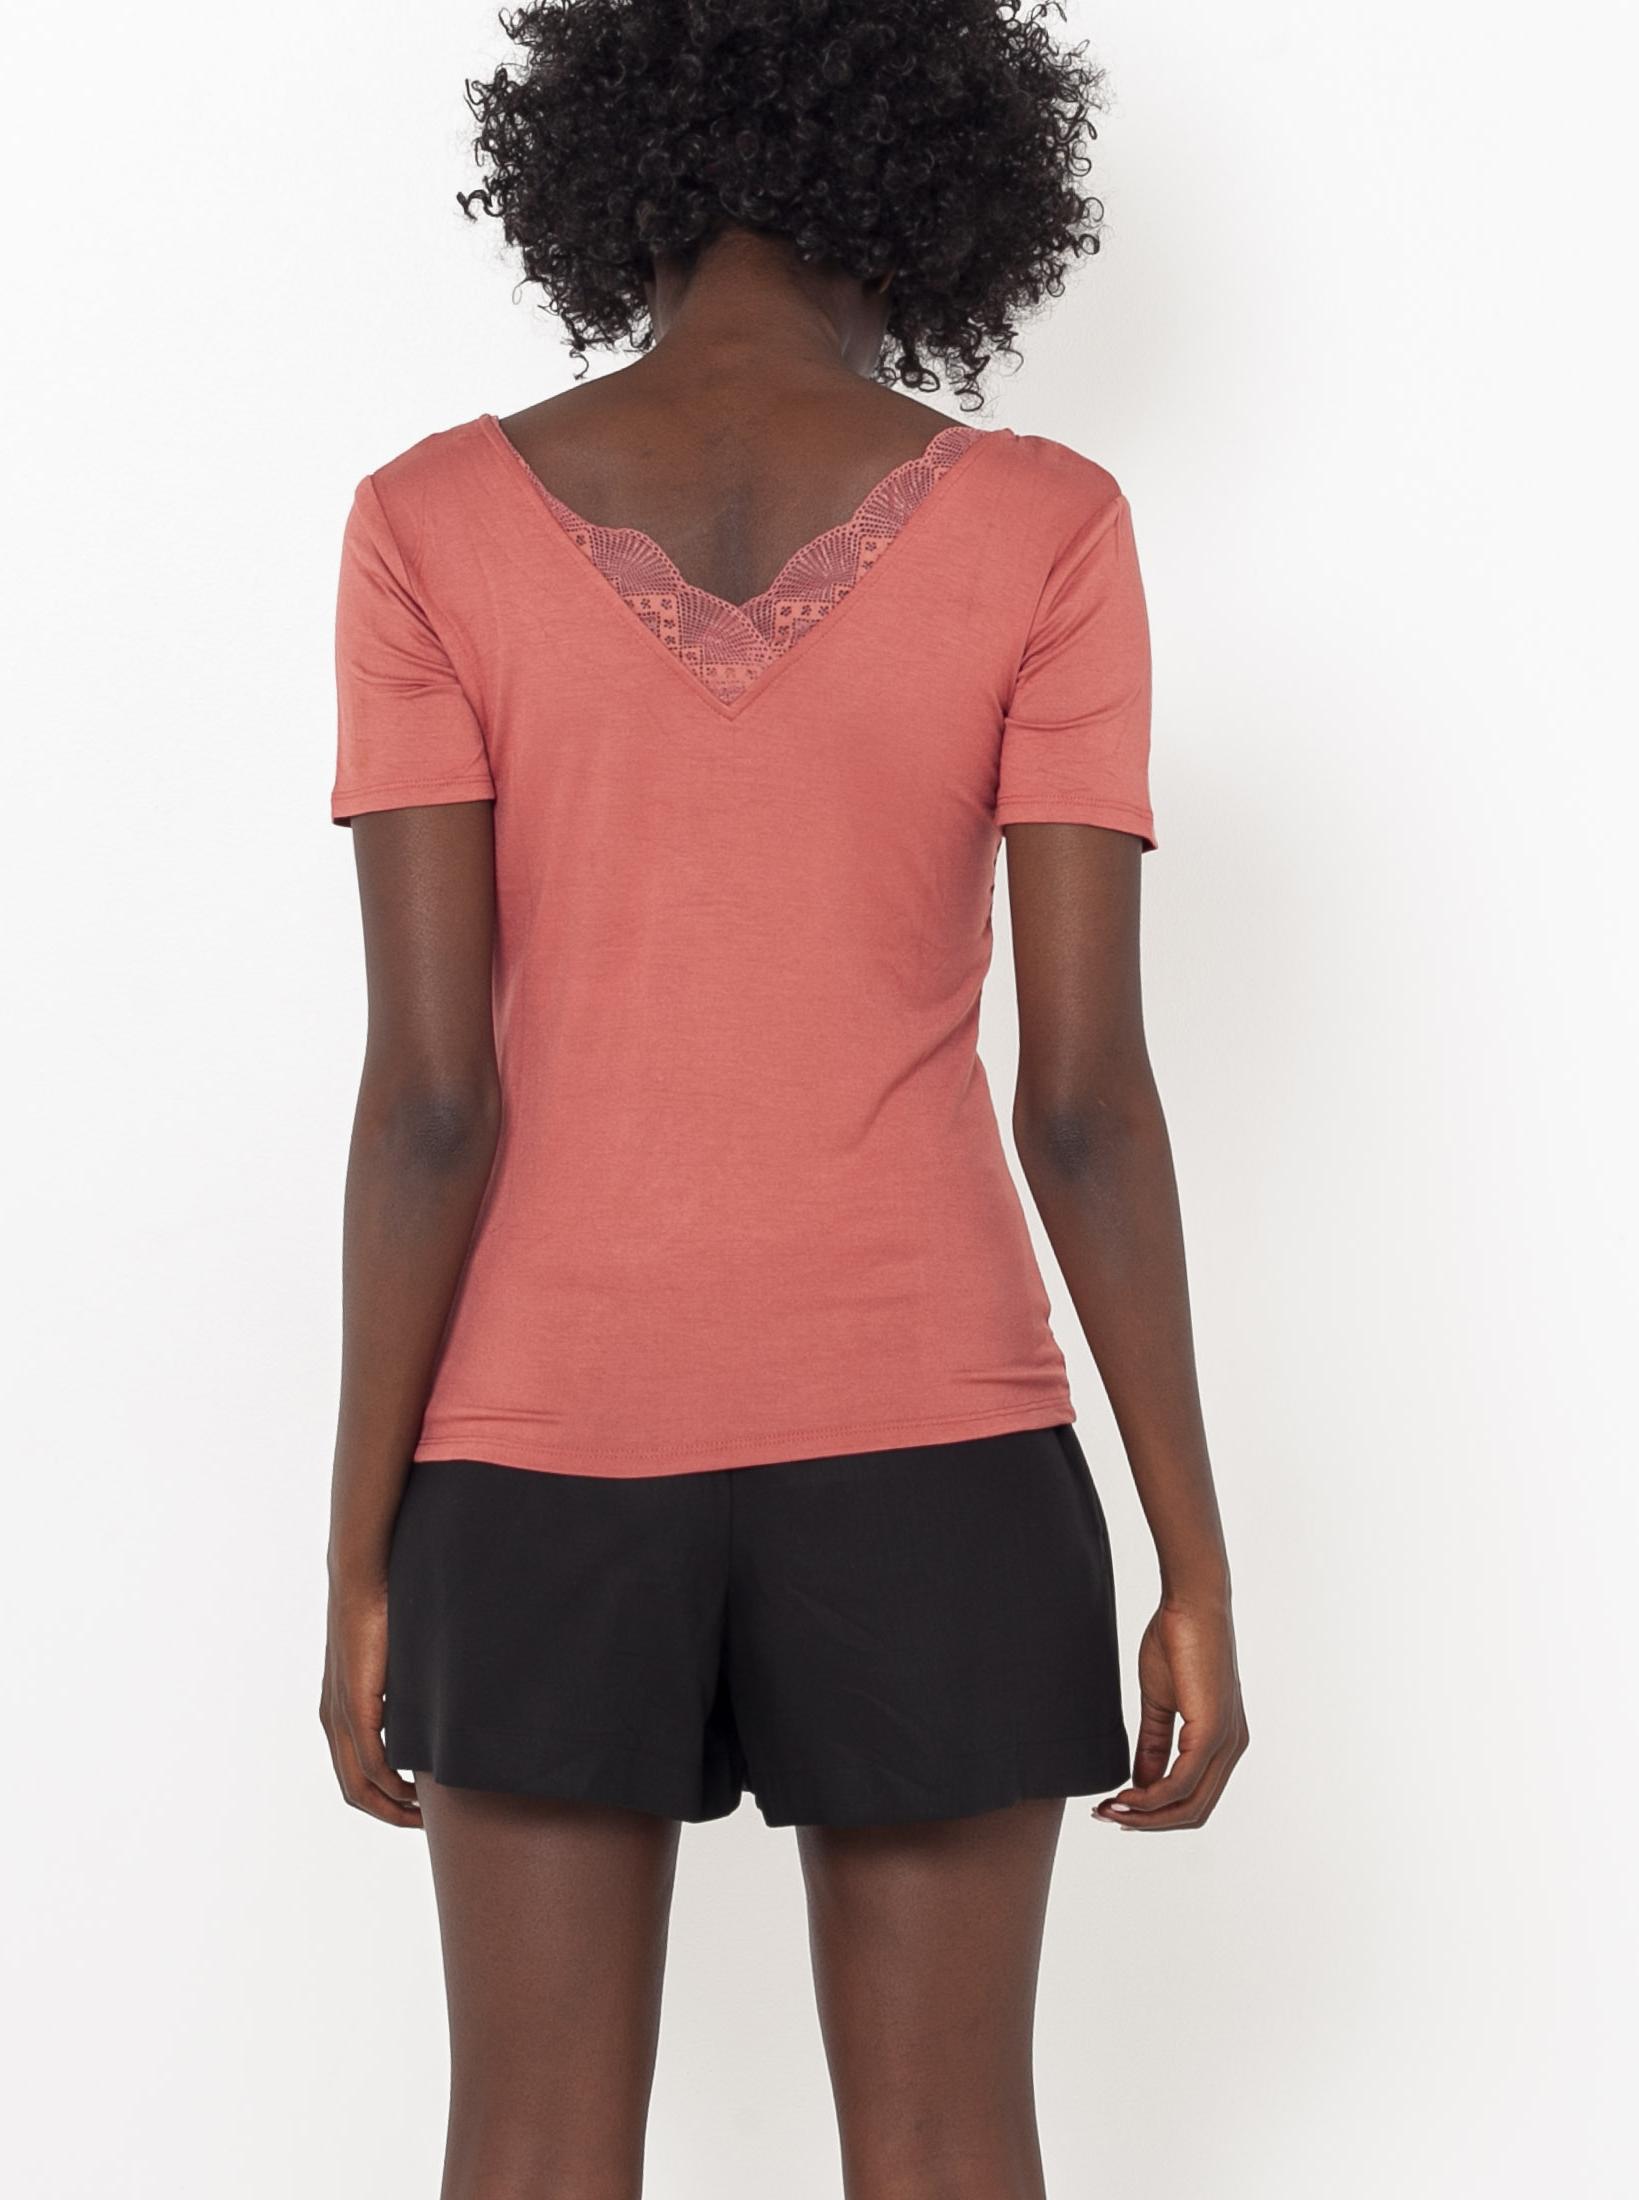 CAMAIEU Women's t-shirt apricot